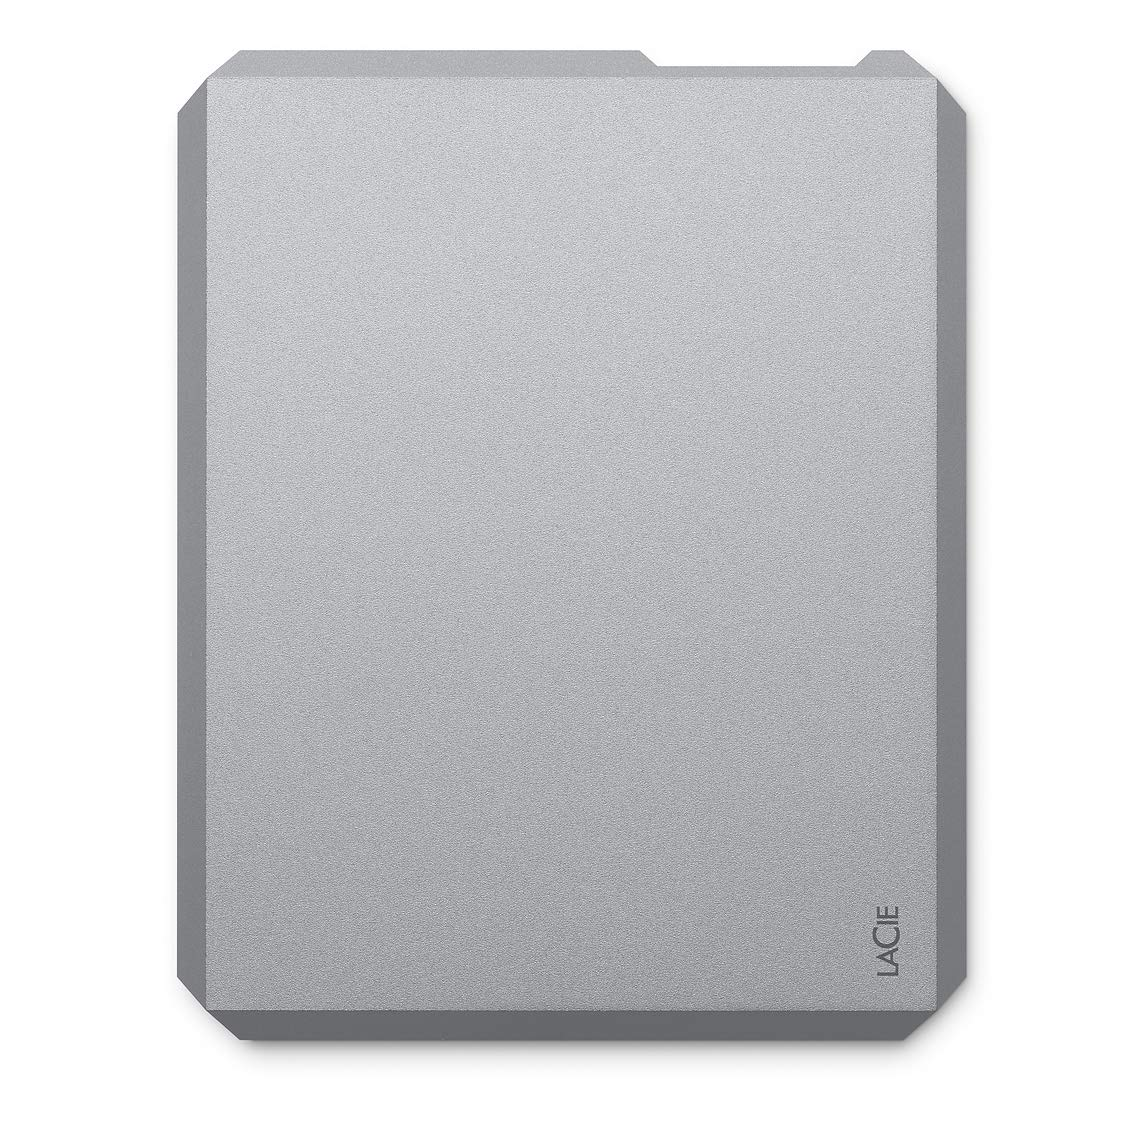 LaCie 500GB Mobile SSD High-Performance External SSD USB-C USB 3.0